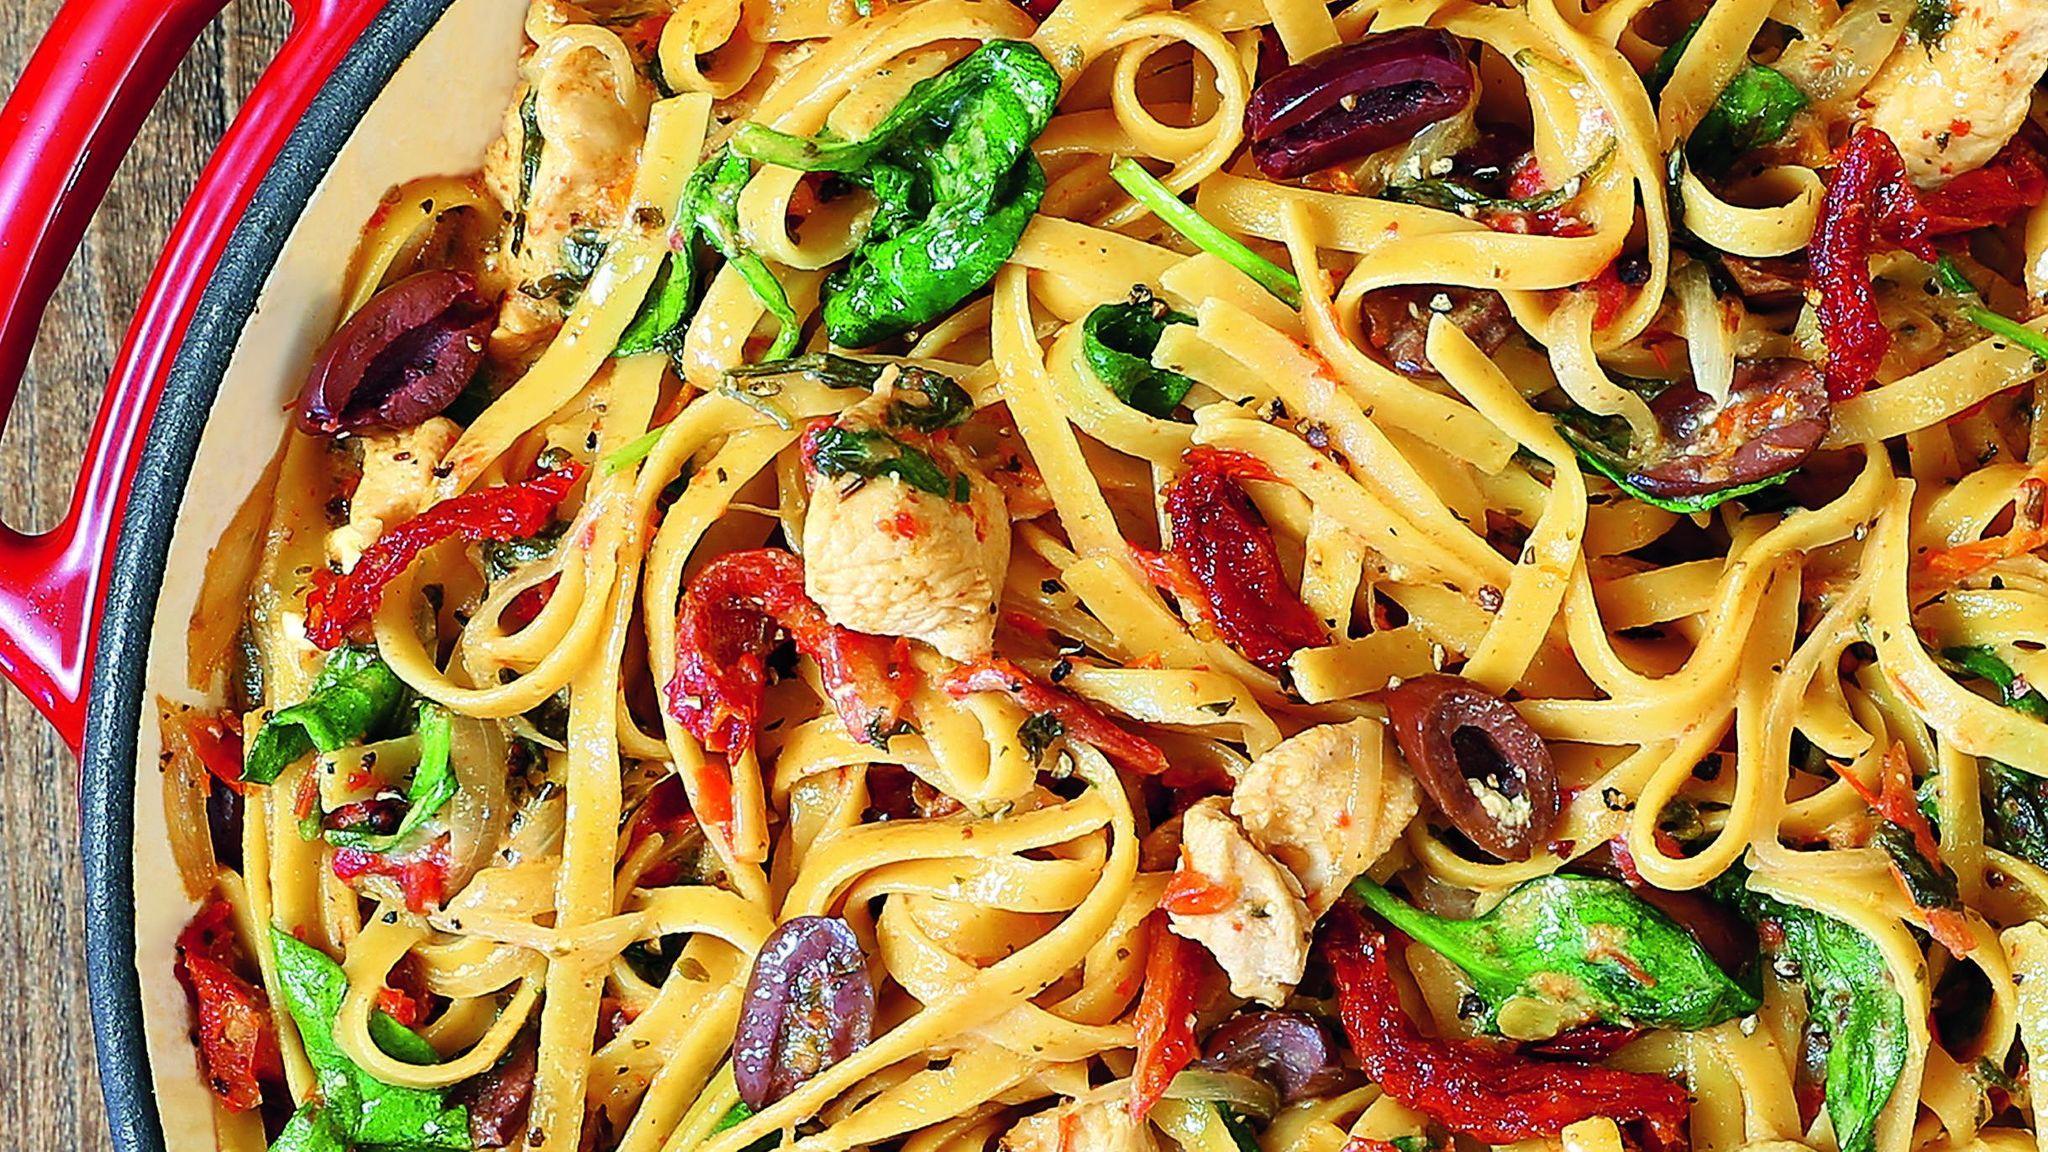 Chicken pasta dish for easy weeknight dinner